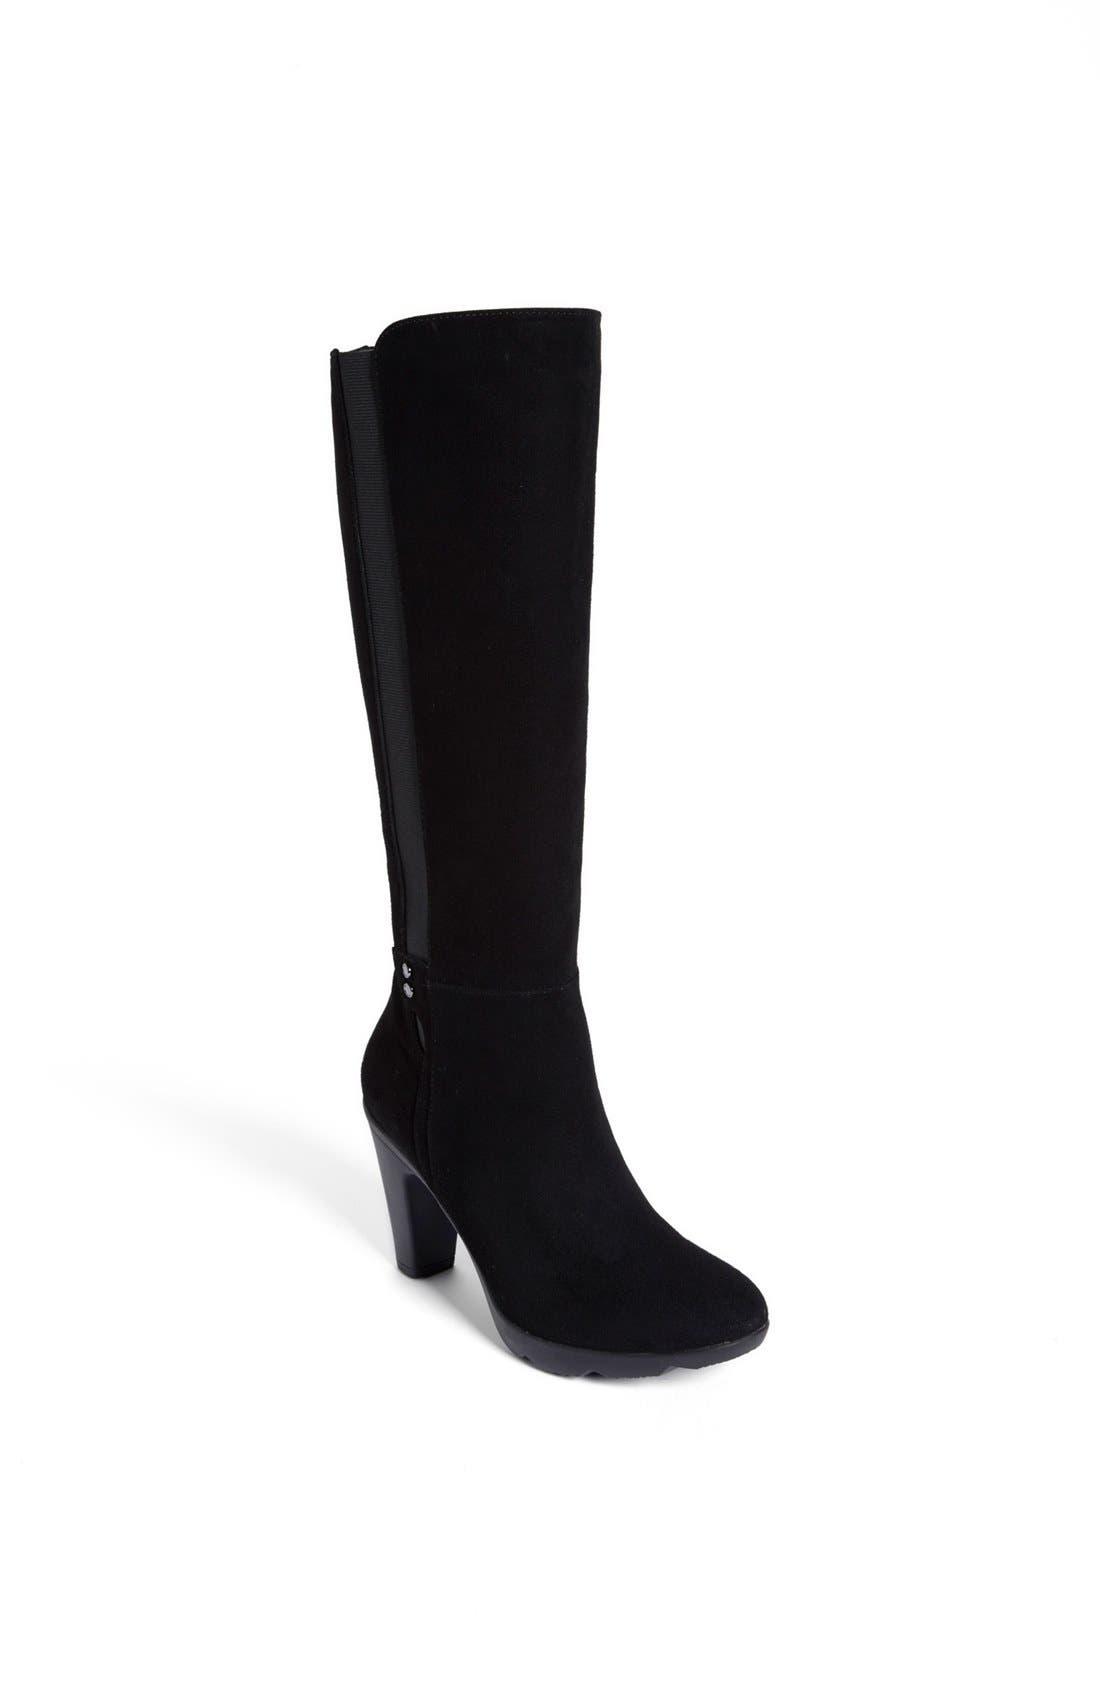 Alternate Image 1 Selected - Blondo 'Louna' Boot